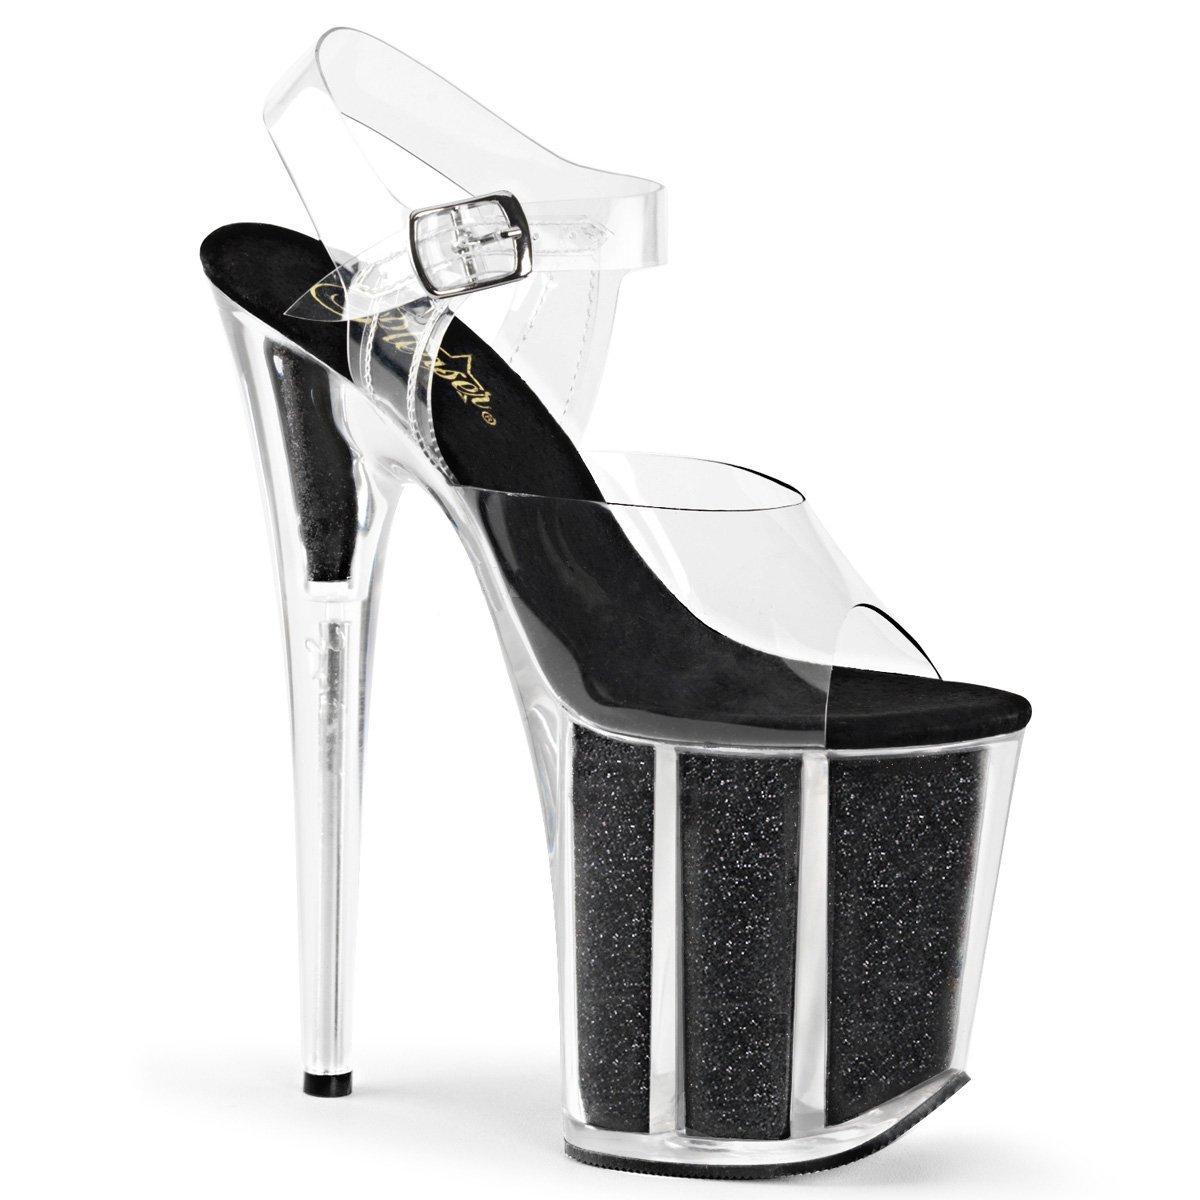 Pleaser FLAMINGO-808G Womens Sandal B017LOHKSW 10 B(M) US|Clr/Blk Gltr